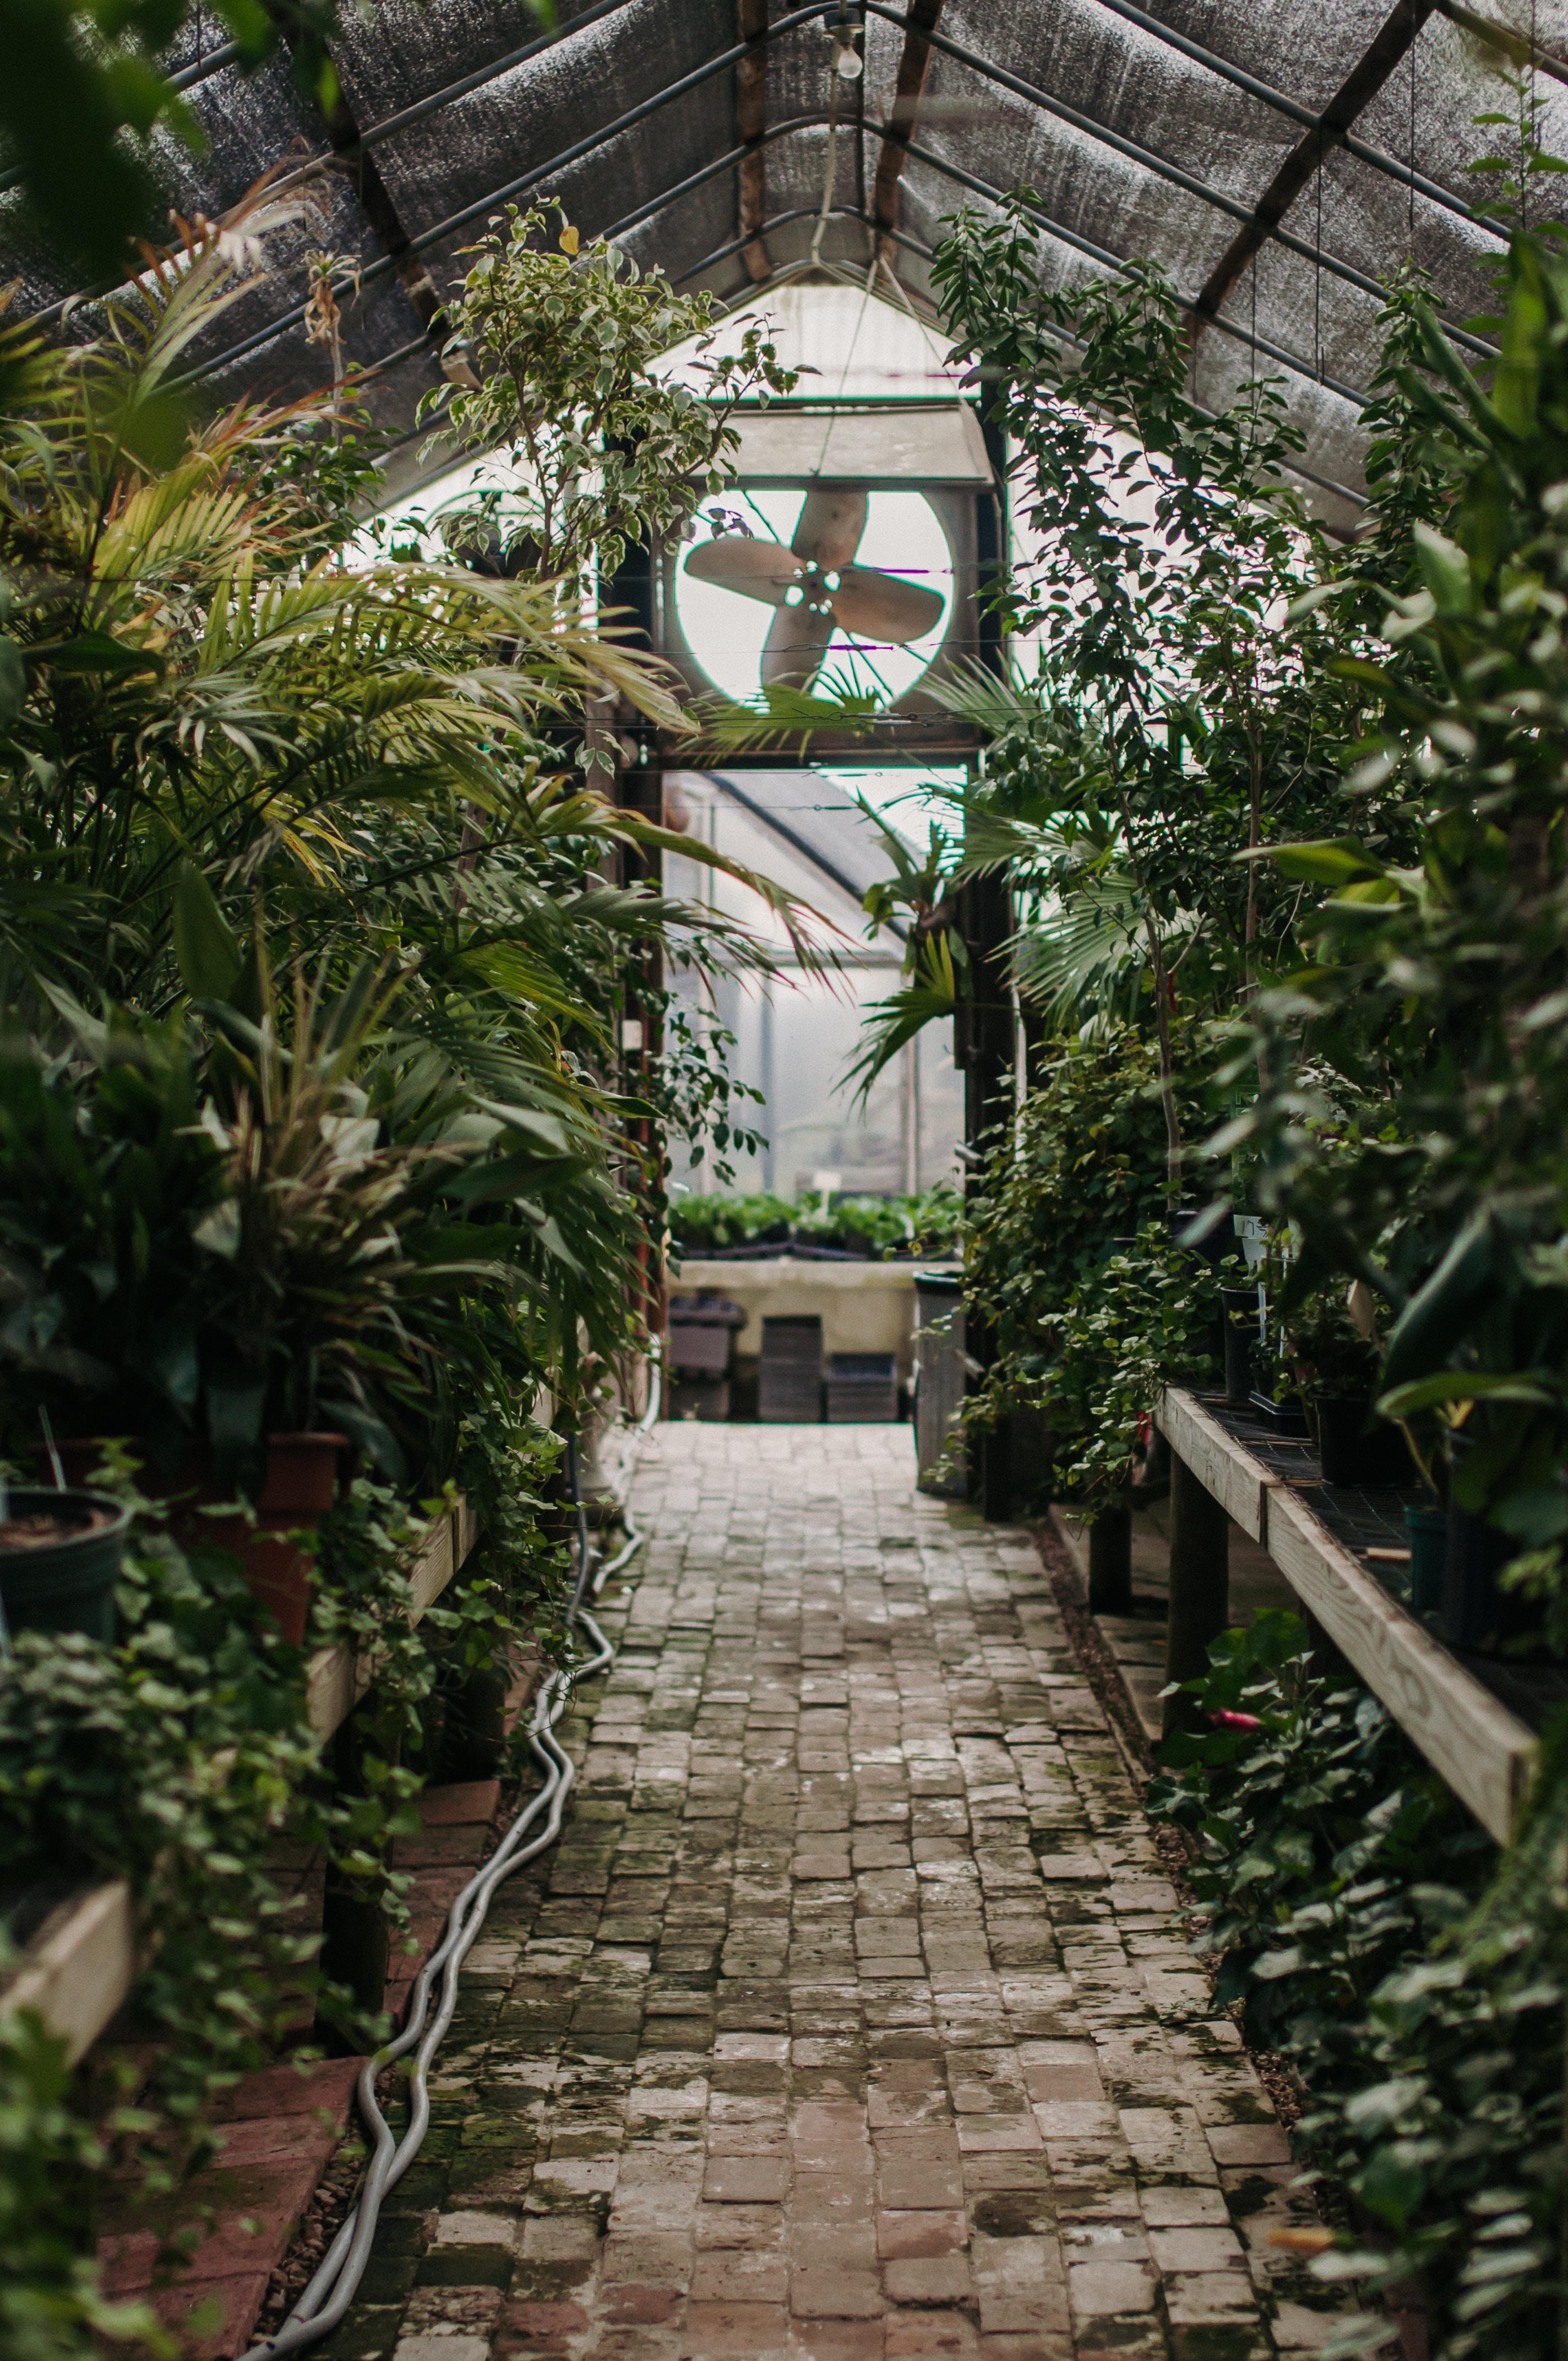 photo of greenhouse interior